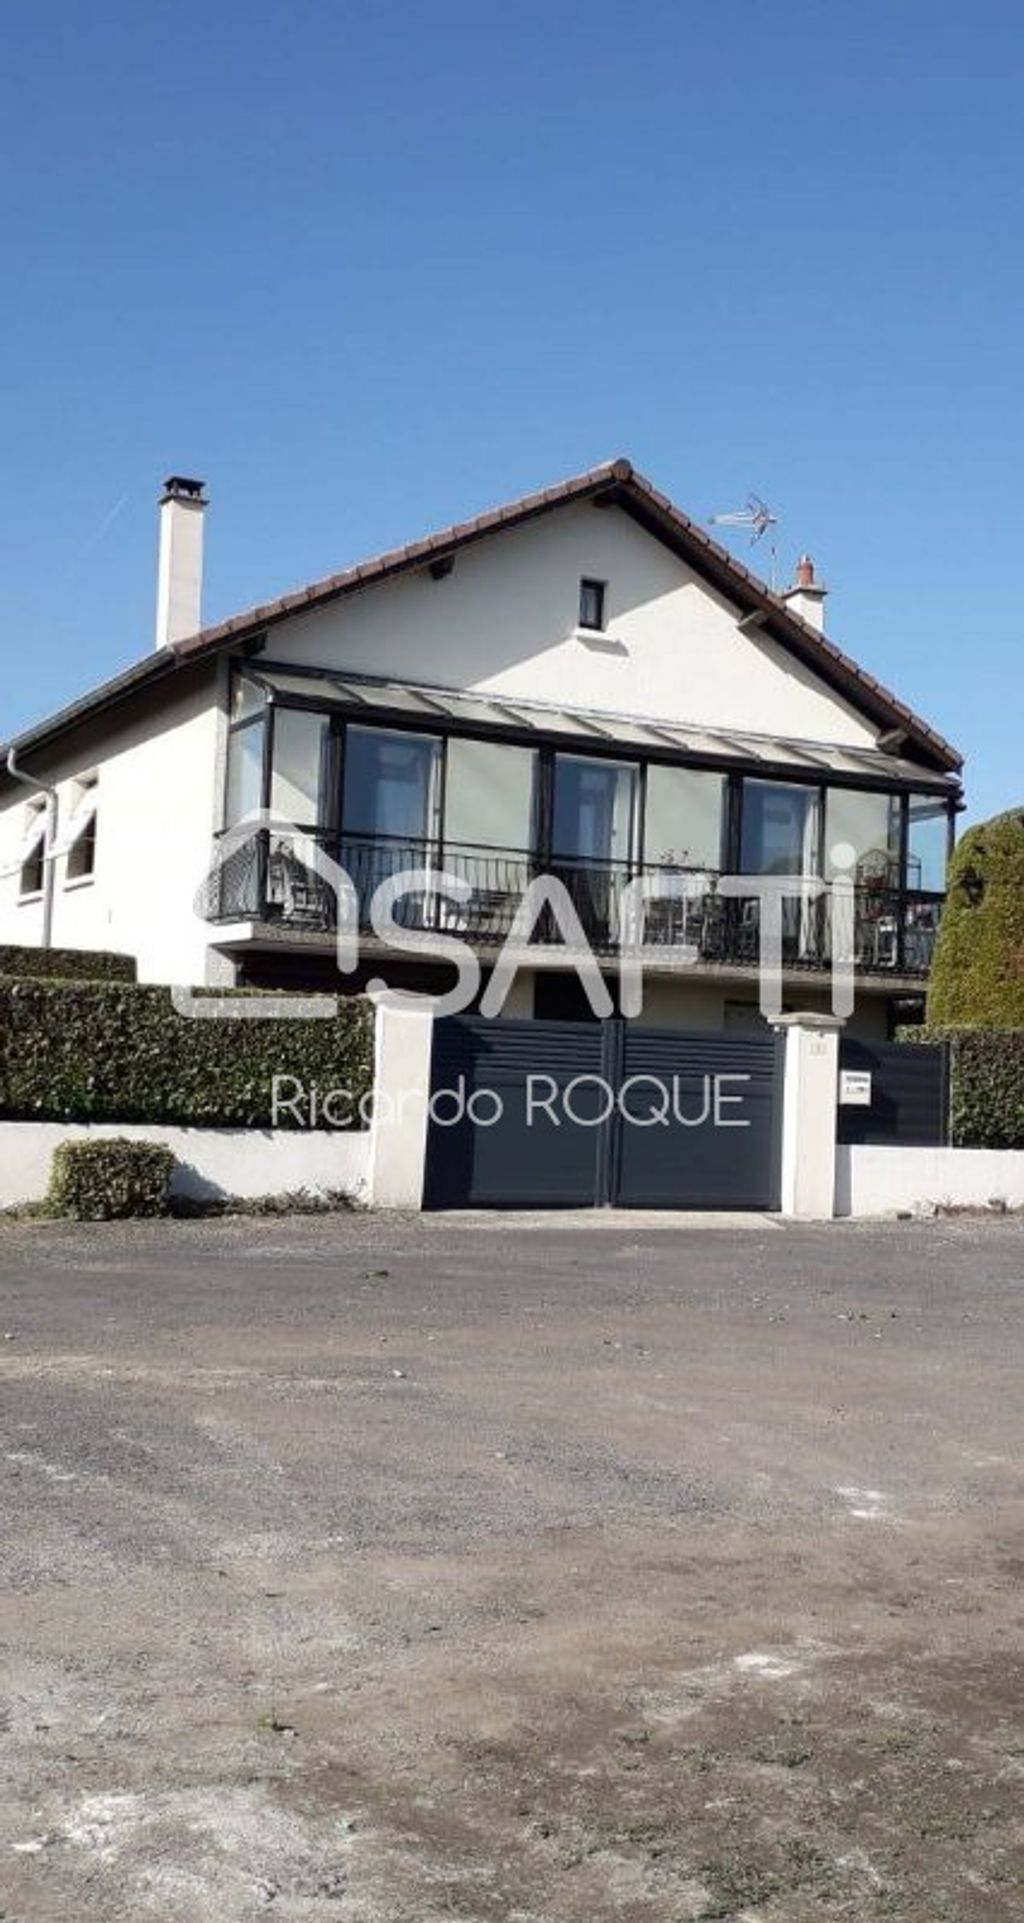 Achat maison 3chambres 120m² - Sainte-Sigolène